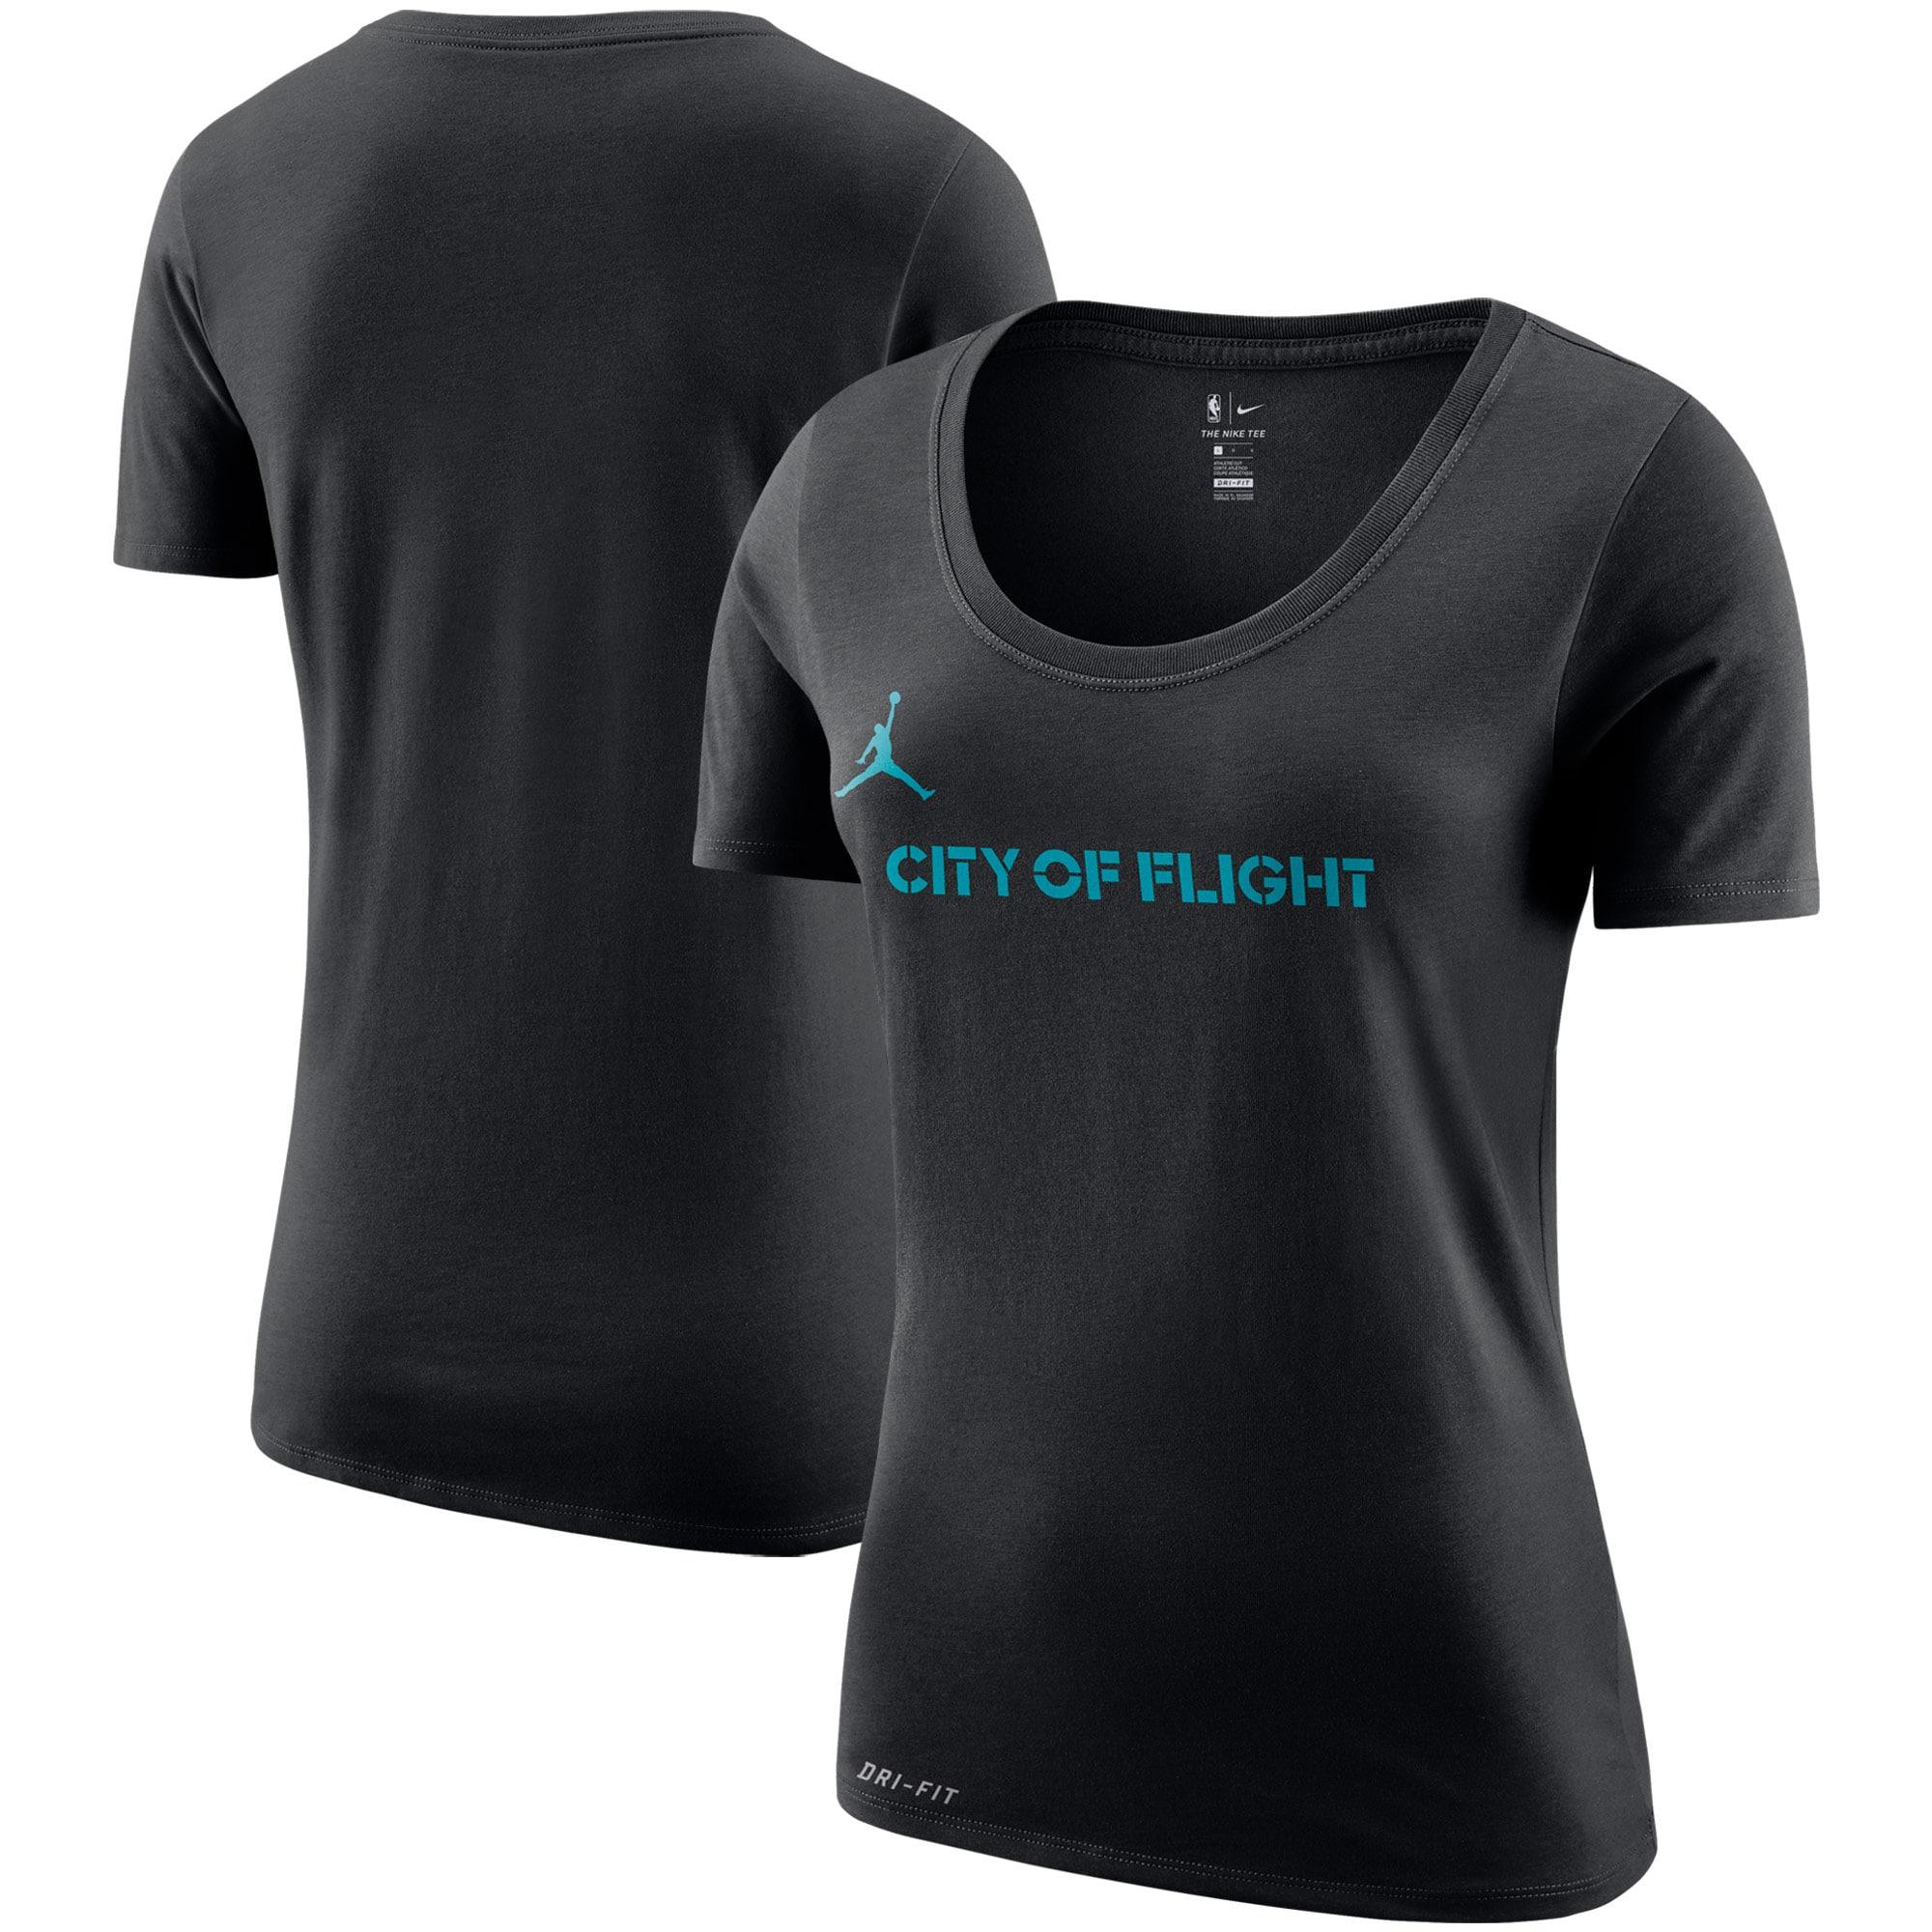 Charlotte Hornets Jordan Brand Women's City Edition Performance Cotton Essential T-Shirt - Black